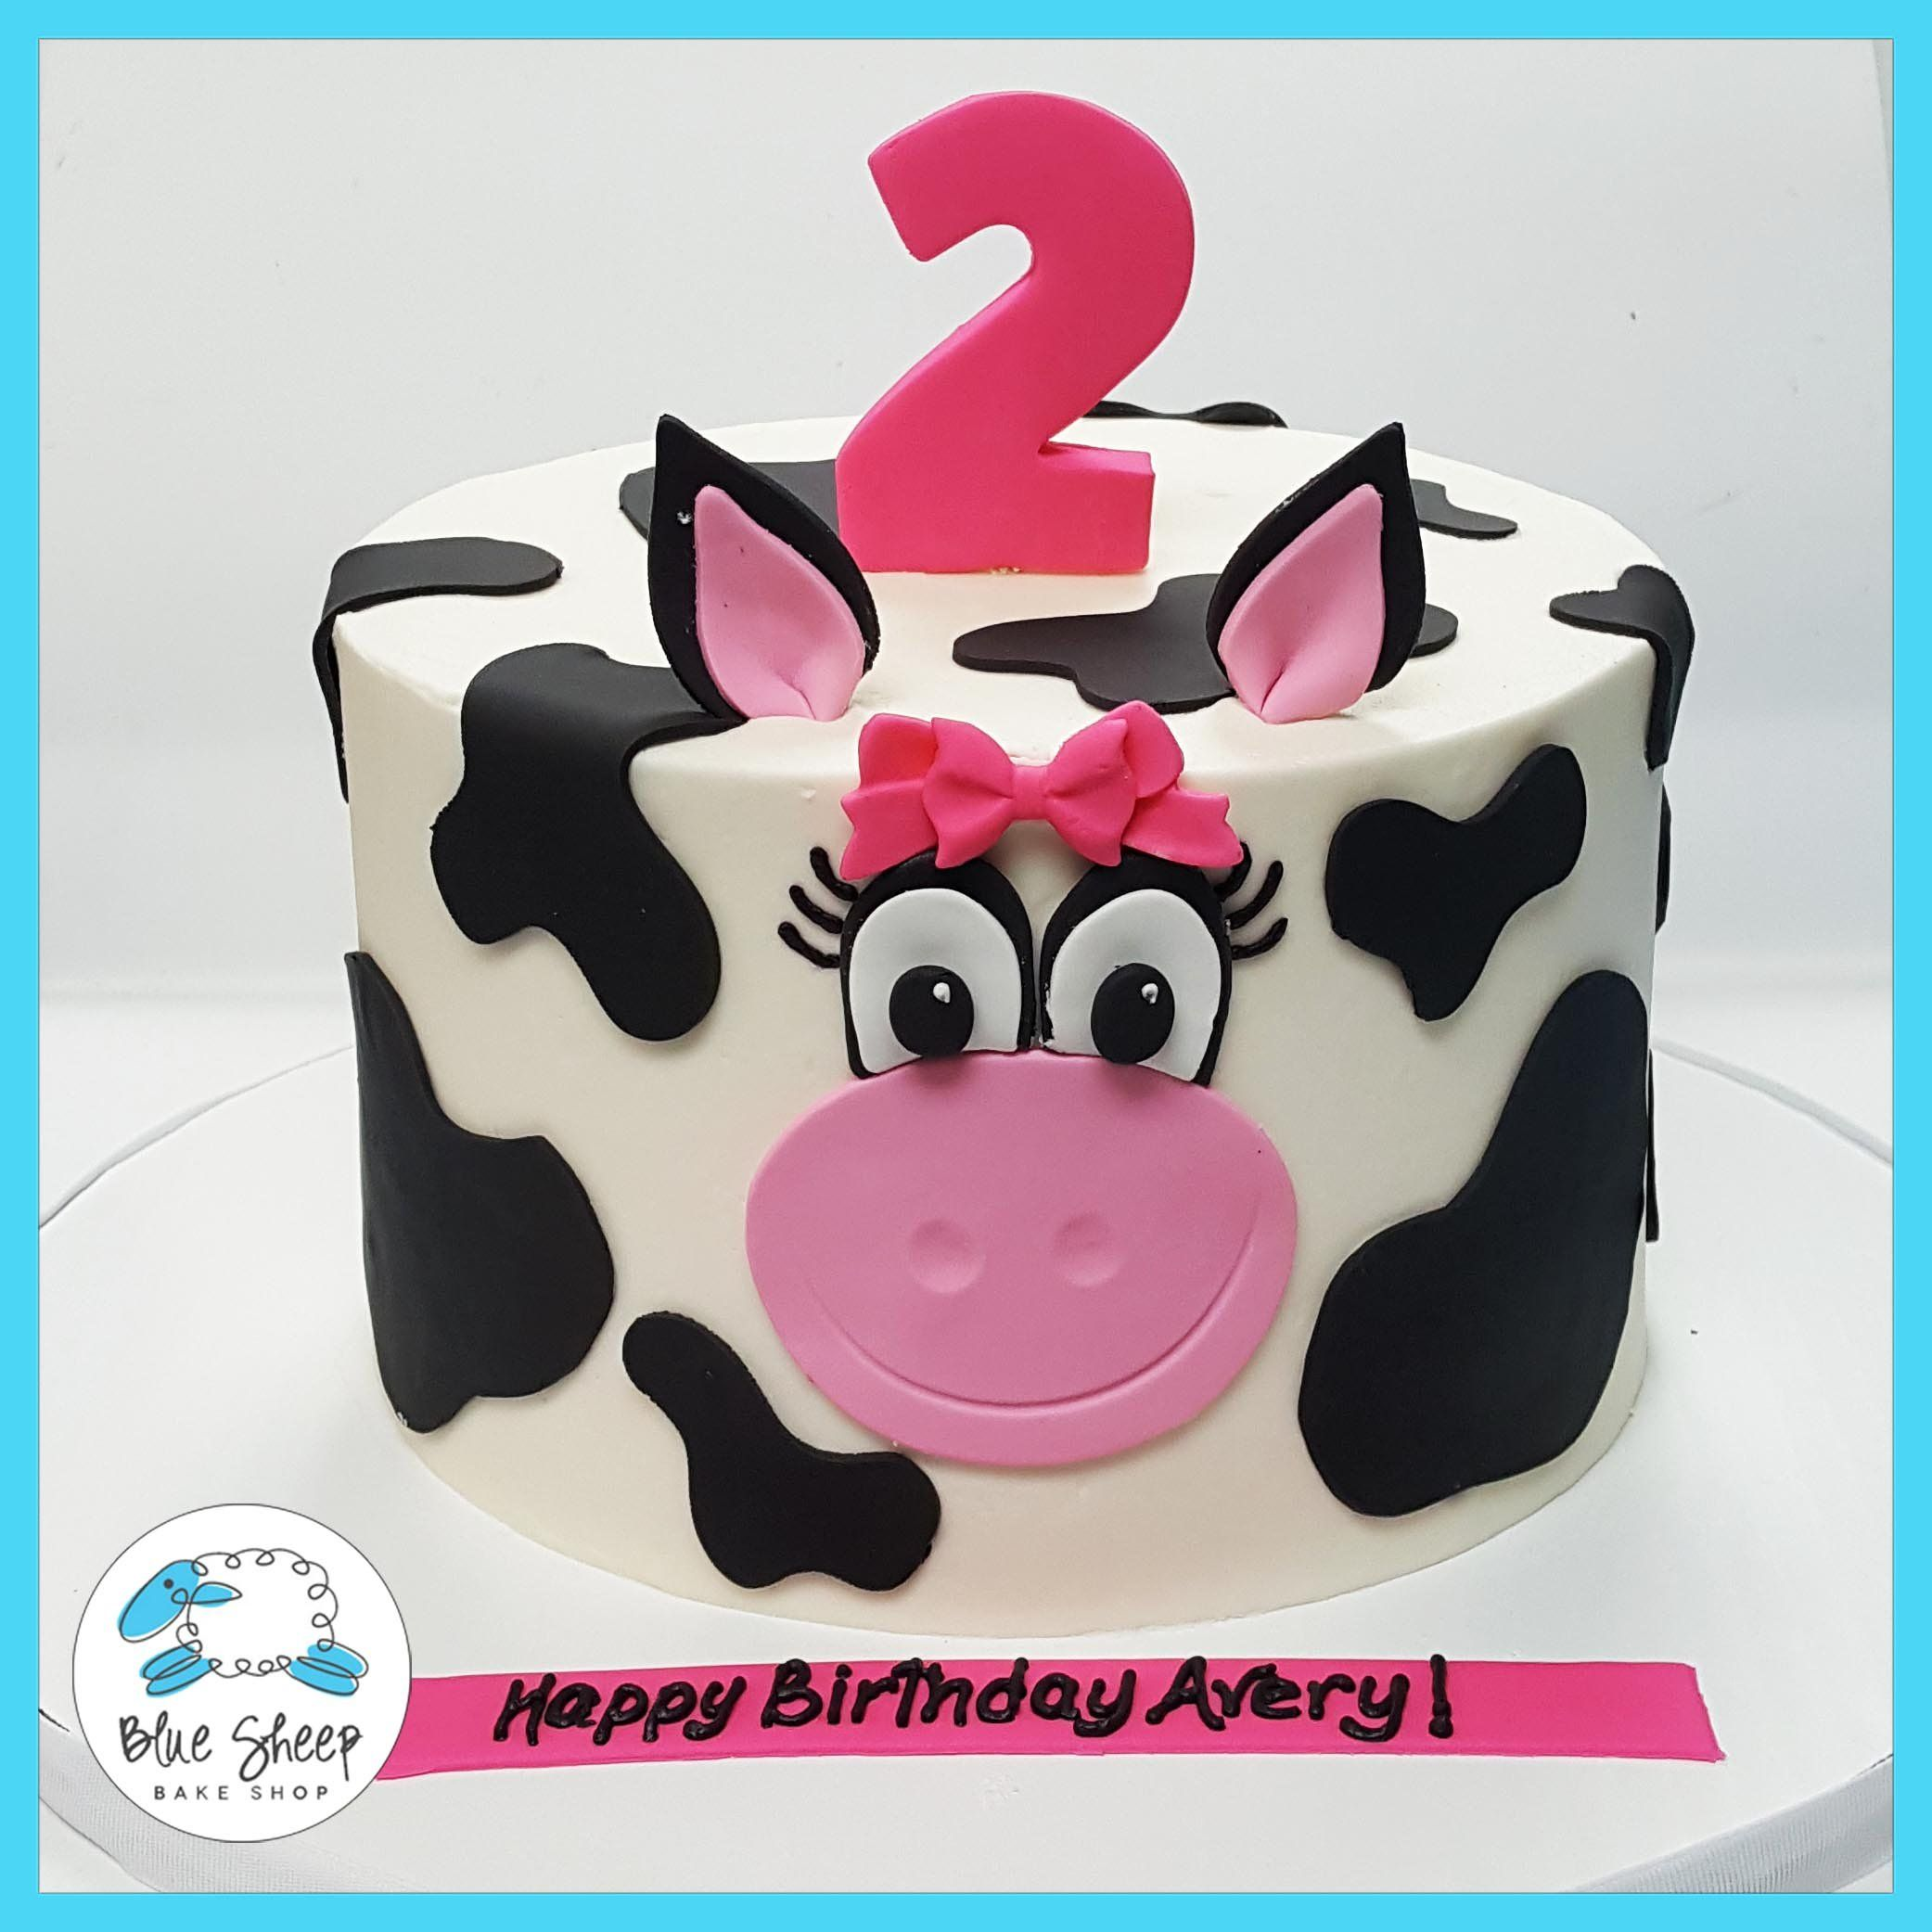 Stupendous Averys Cow Birthday Cake Cow Birthday Cake Cow Birthday Birthday Cards Printable Riciscafe Filternl